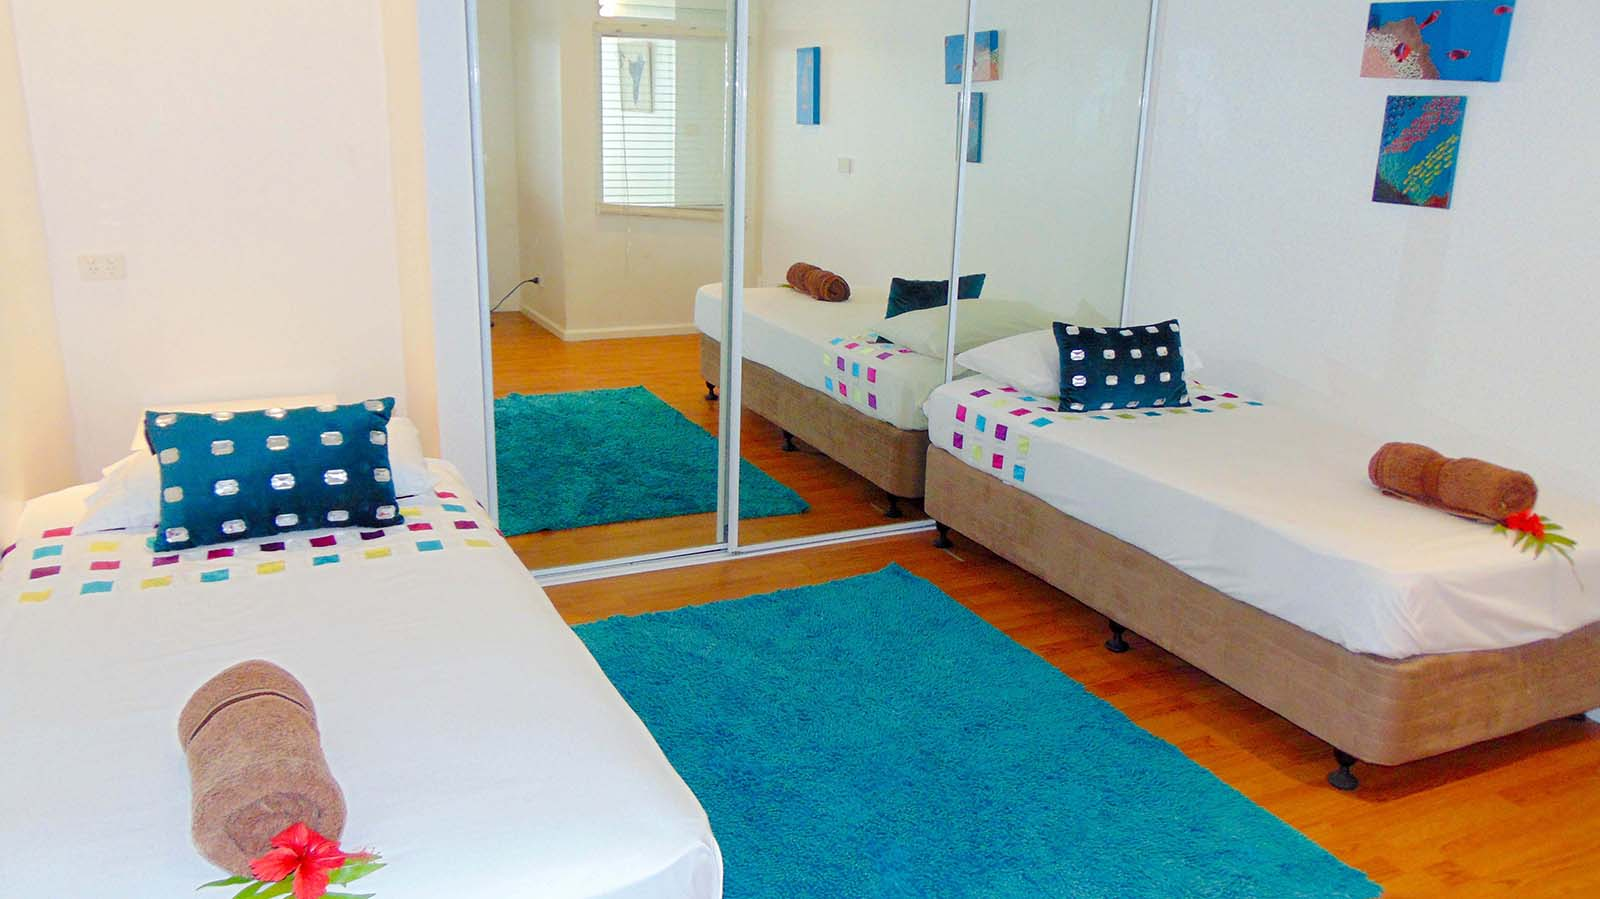 Bedroom n°3 - Two single beds